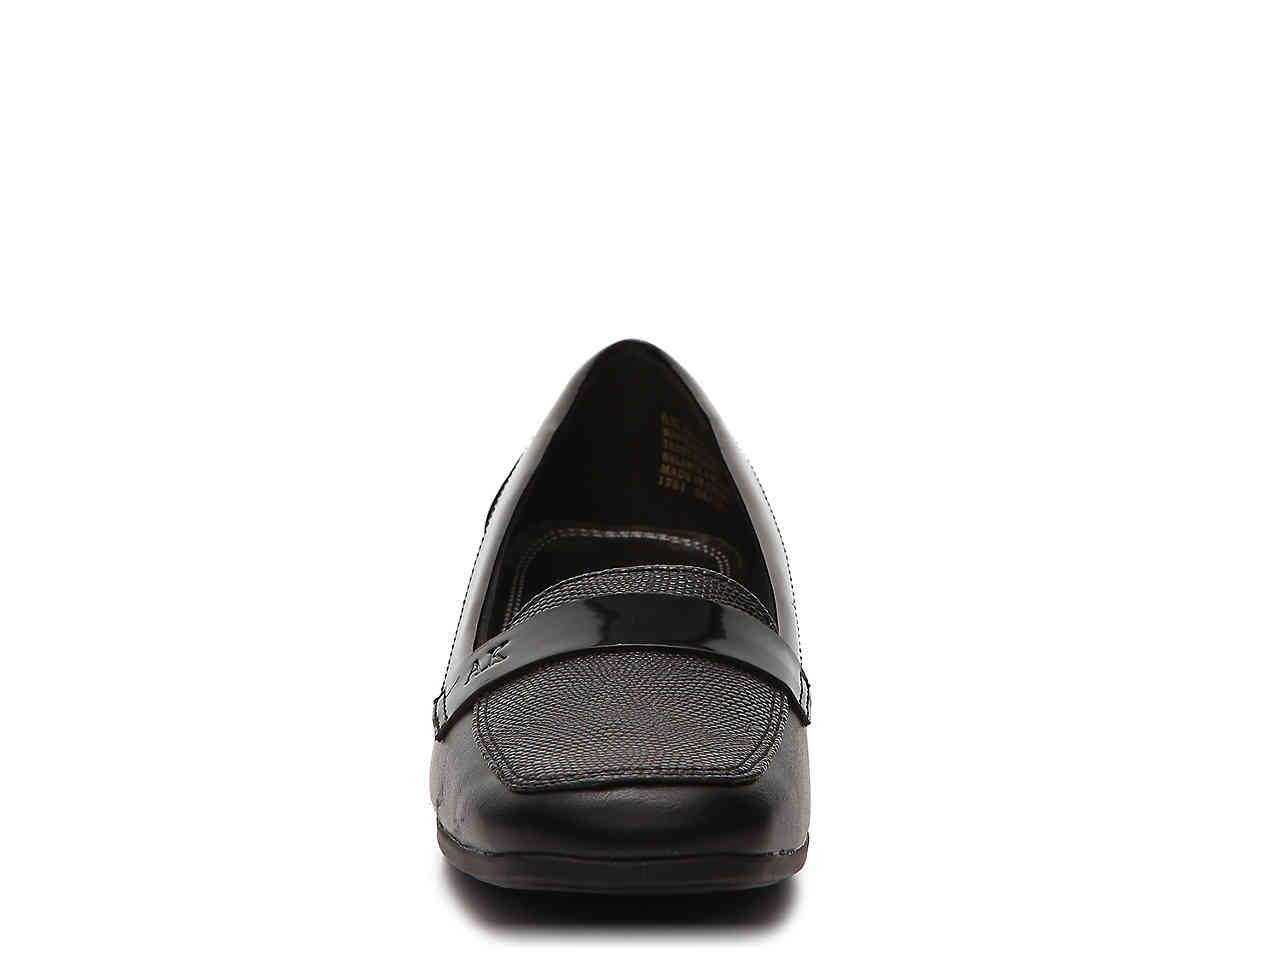 8325abab4a4 Anne Klein - Black Vittorio Loafer - Lyst. View fullscreen